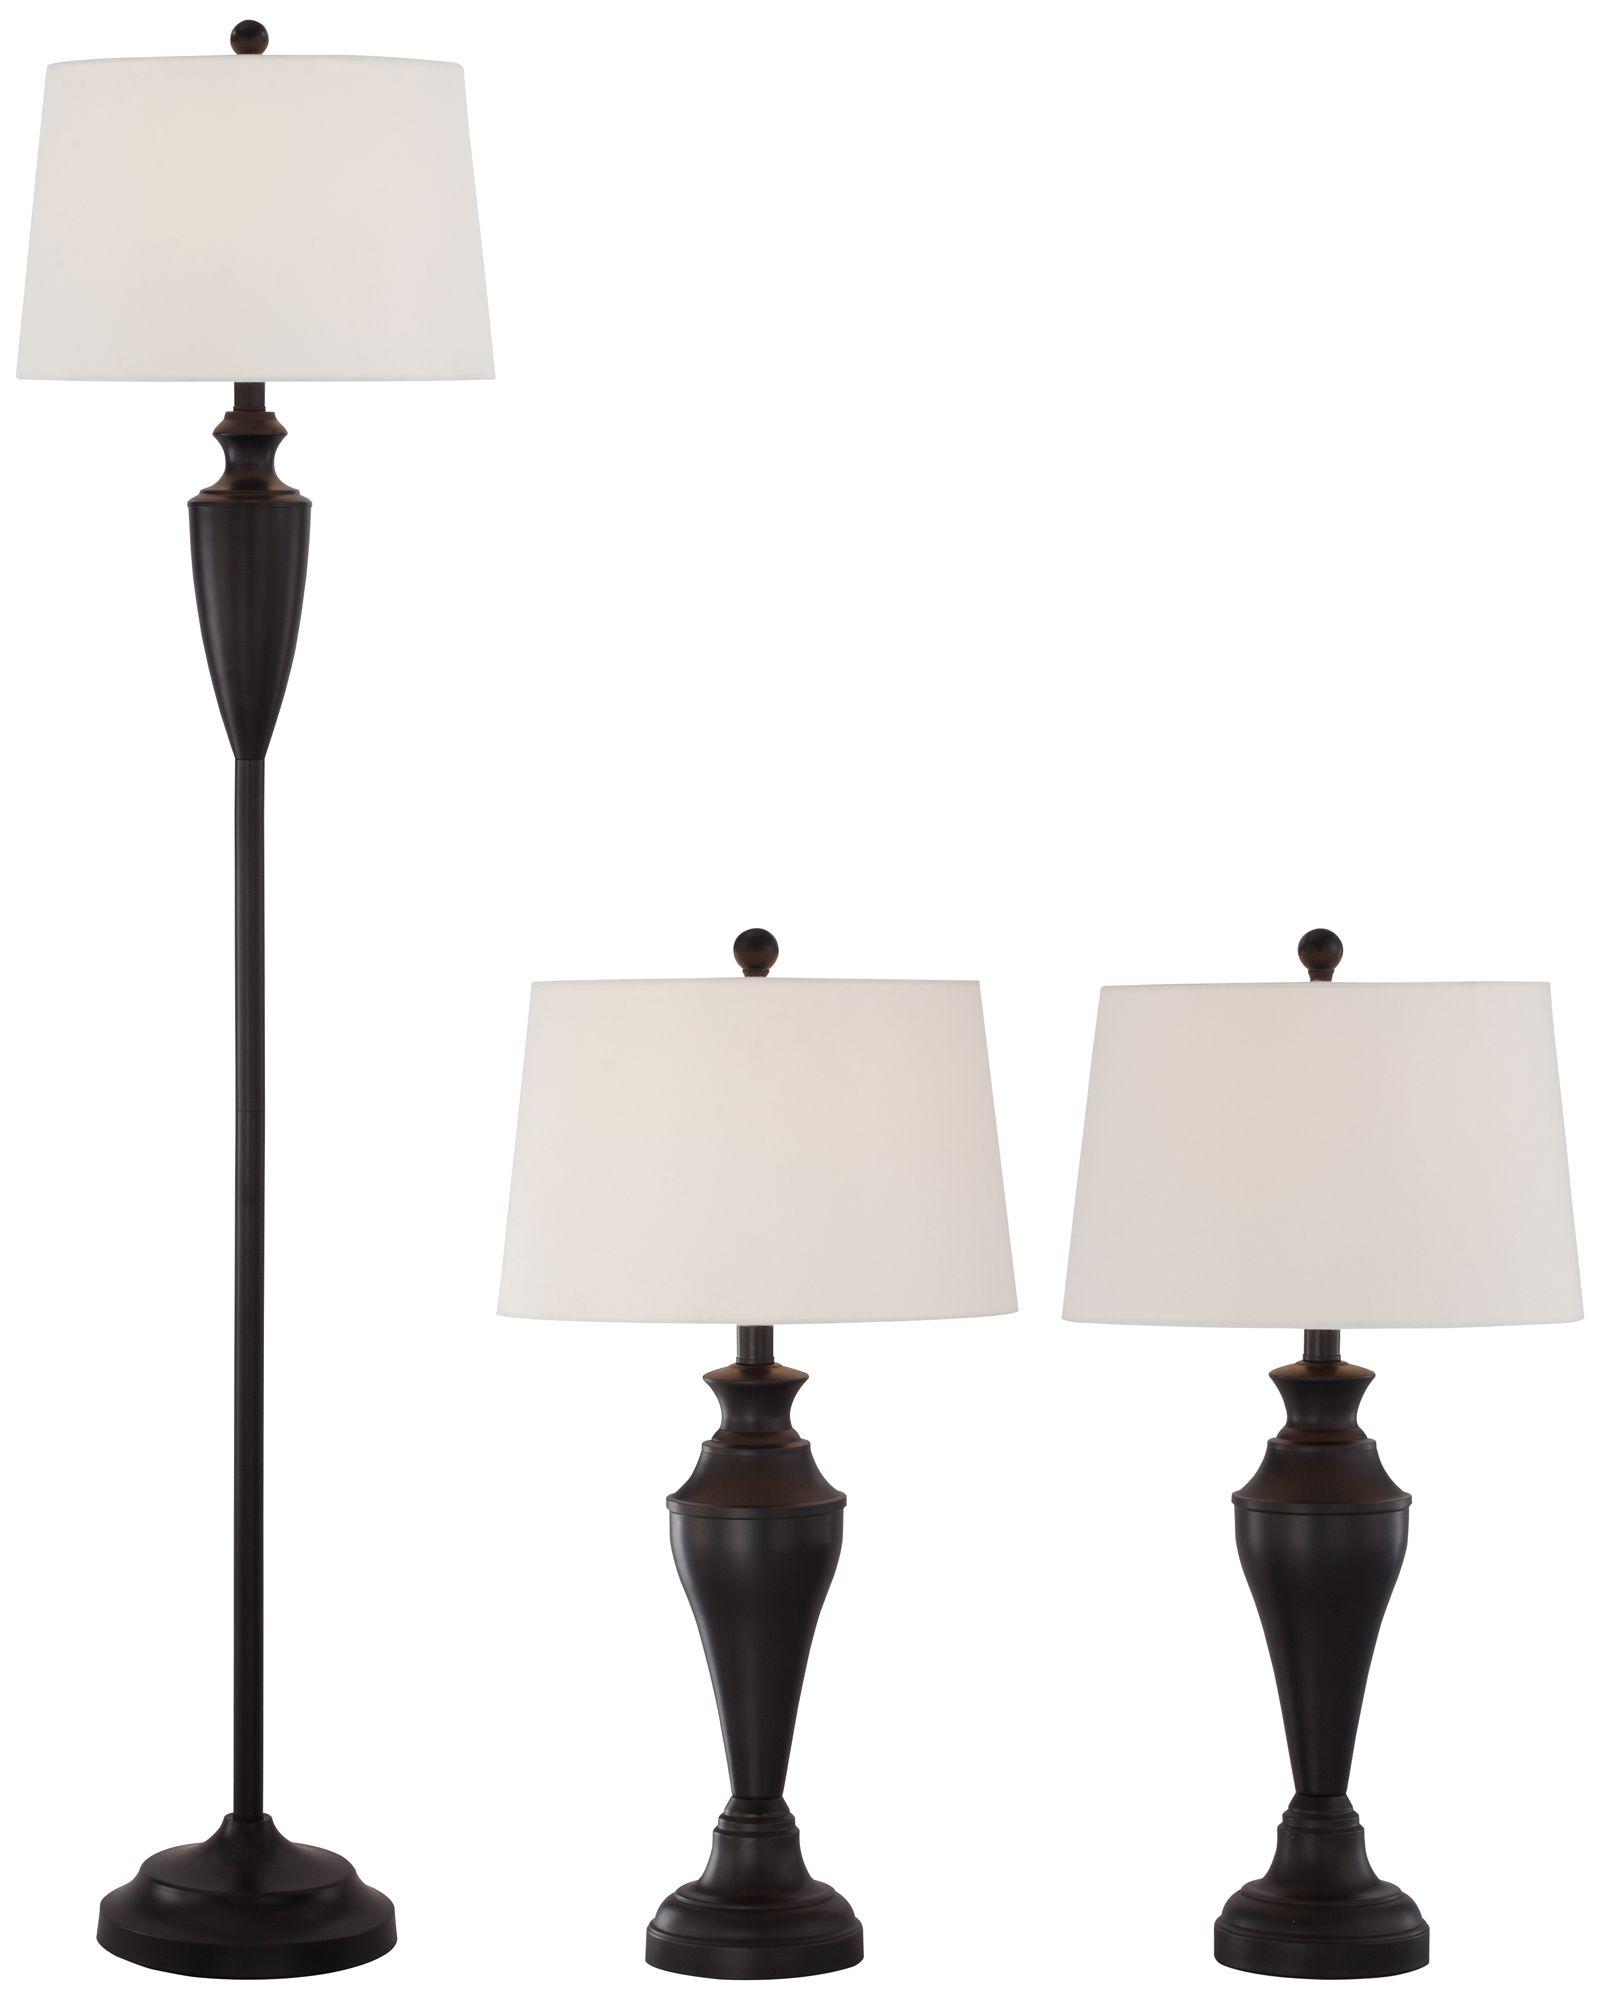 Denny Bronze 3-Piece Floor and Table L& Set  sc 1 st  L&s Plus & Floor Lamp Sets - Matching Table \u0026 Floor Designs | Lamps Plus